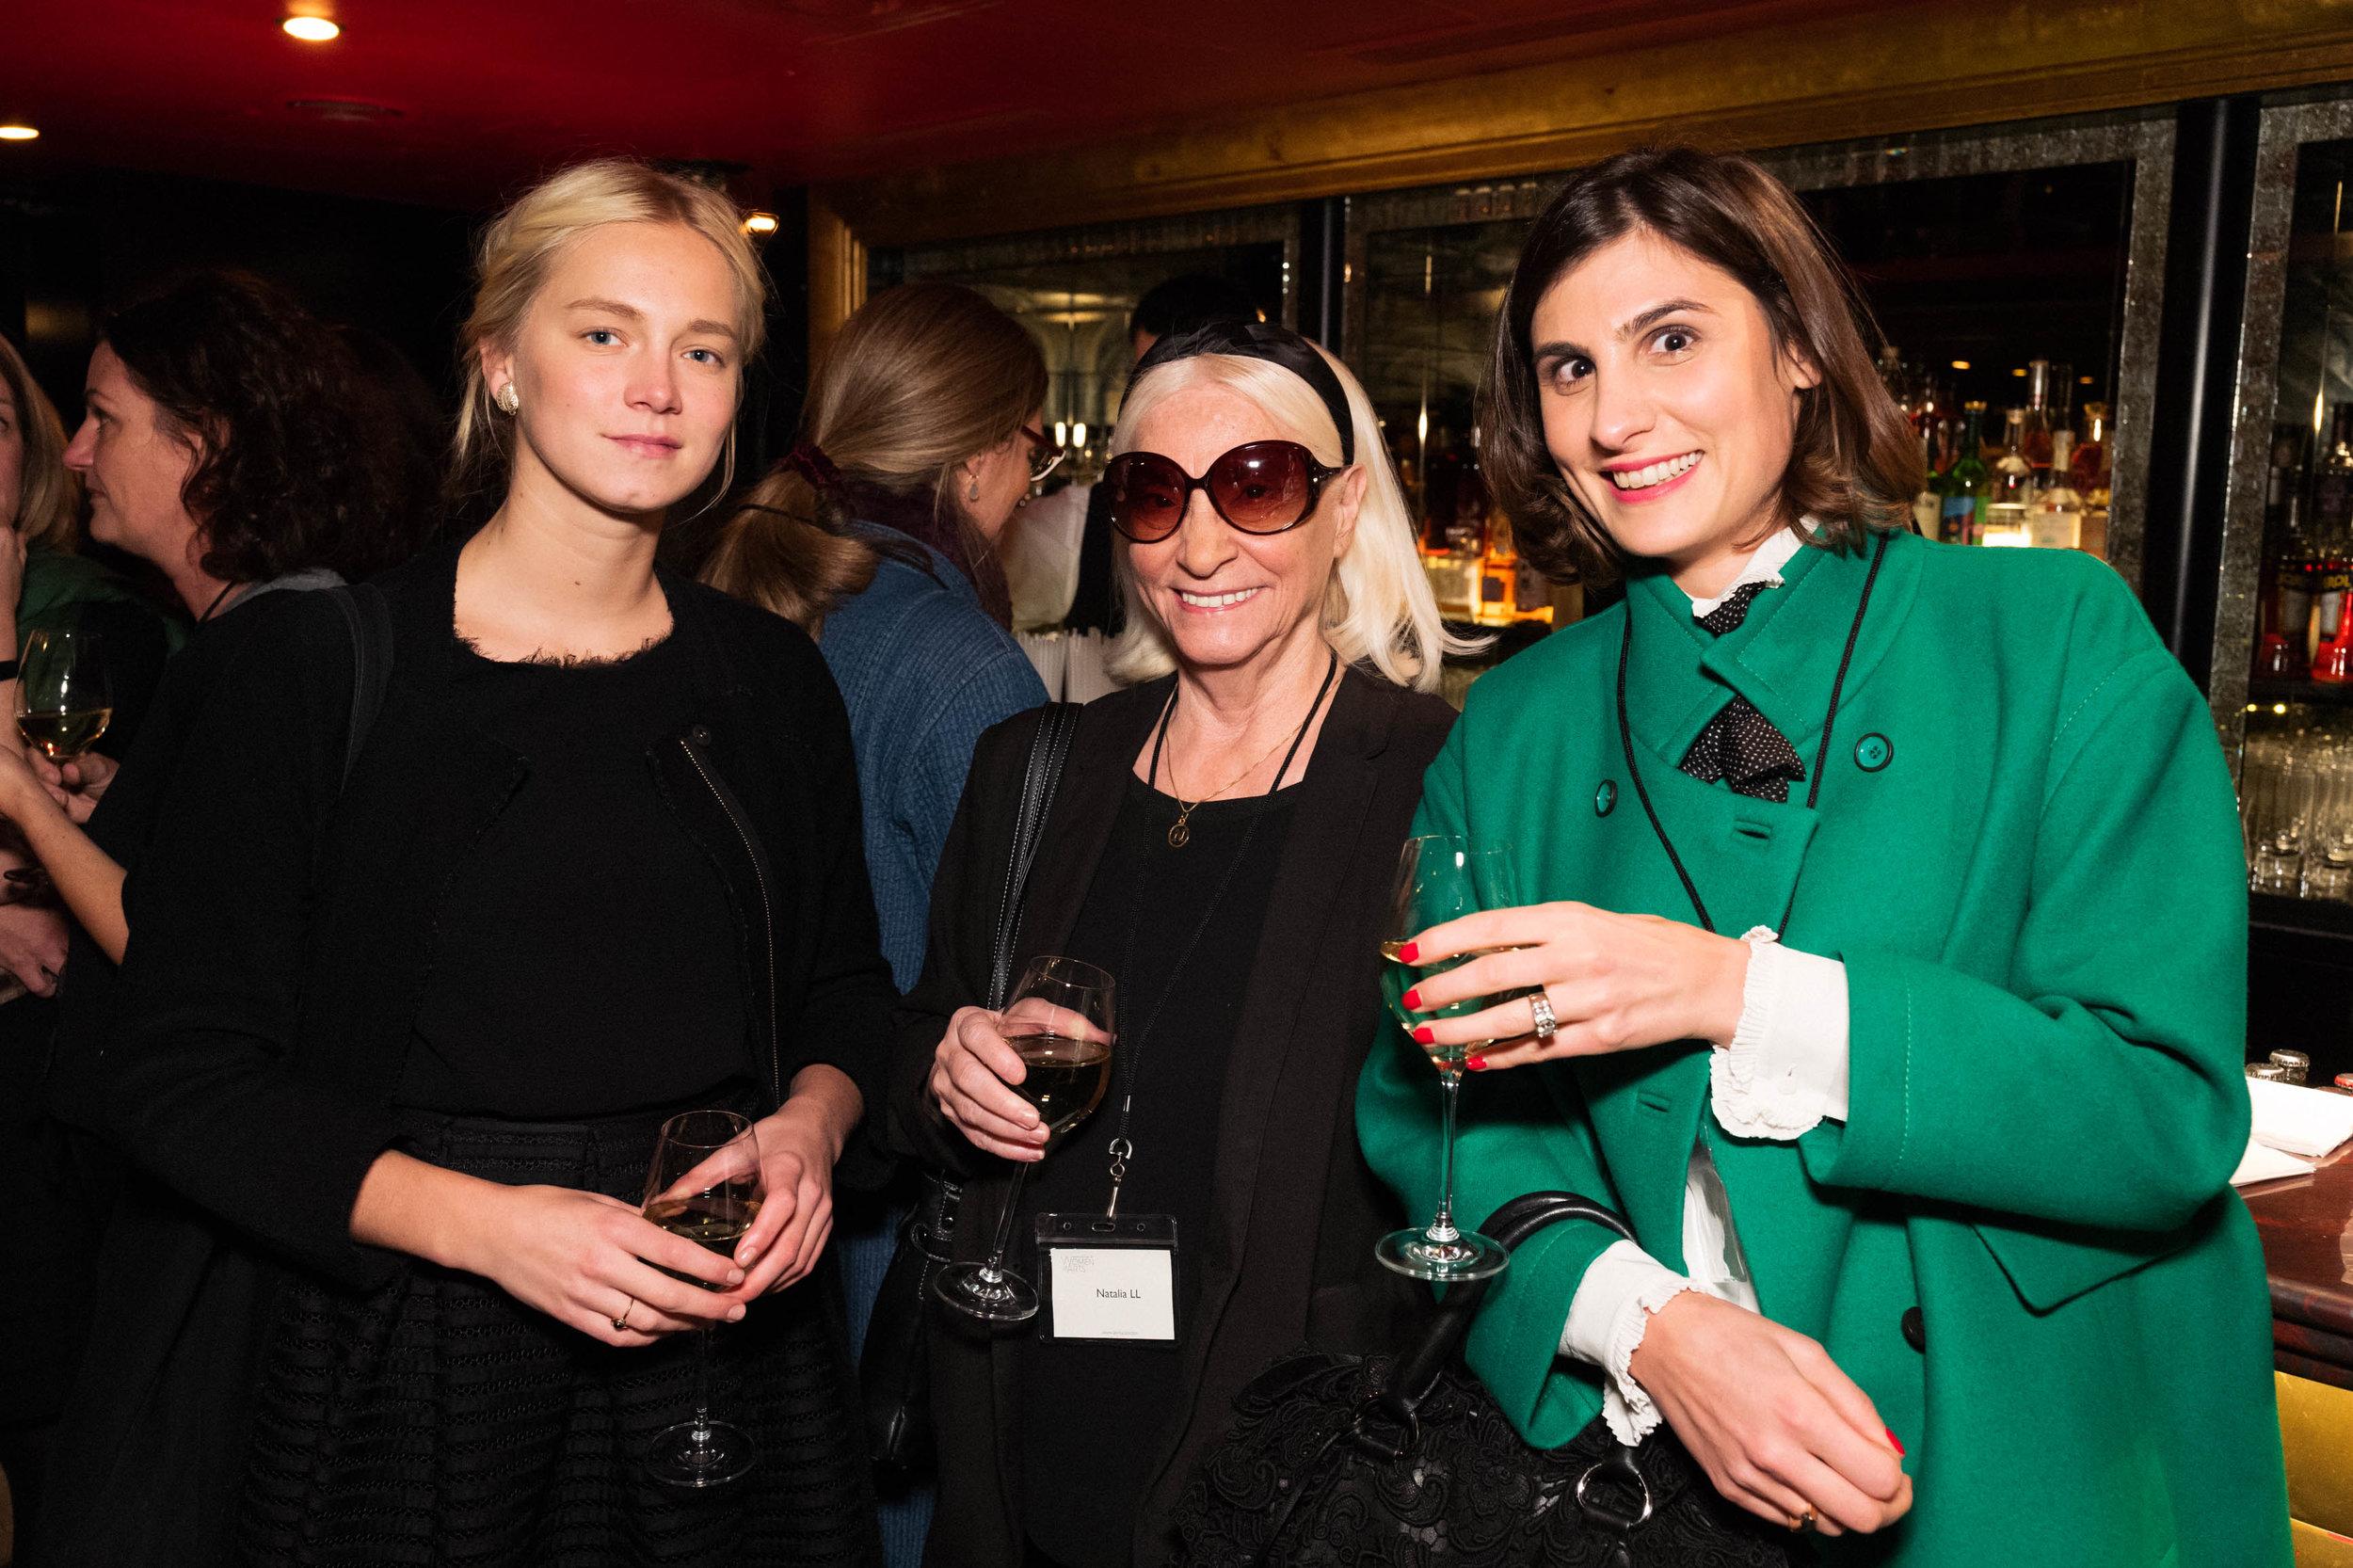 Mia Dudek, Natalia LL and Marisa Bellani